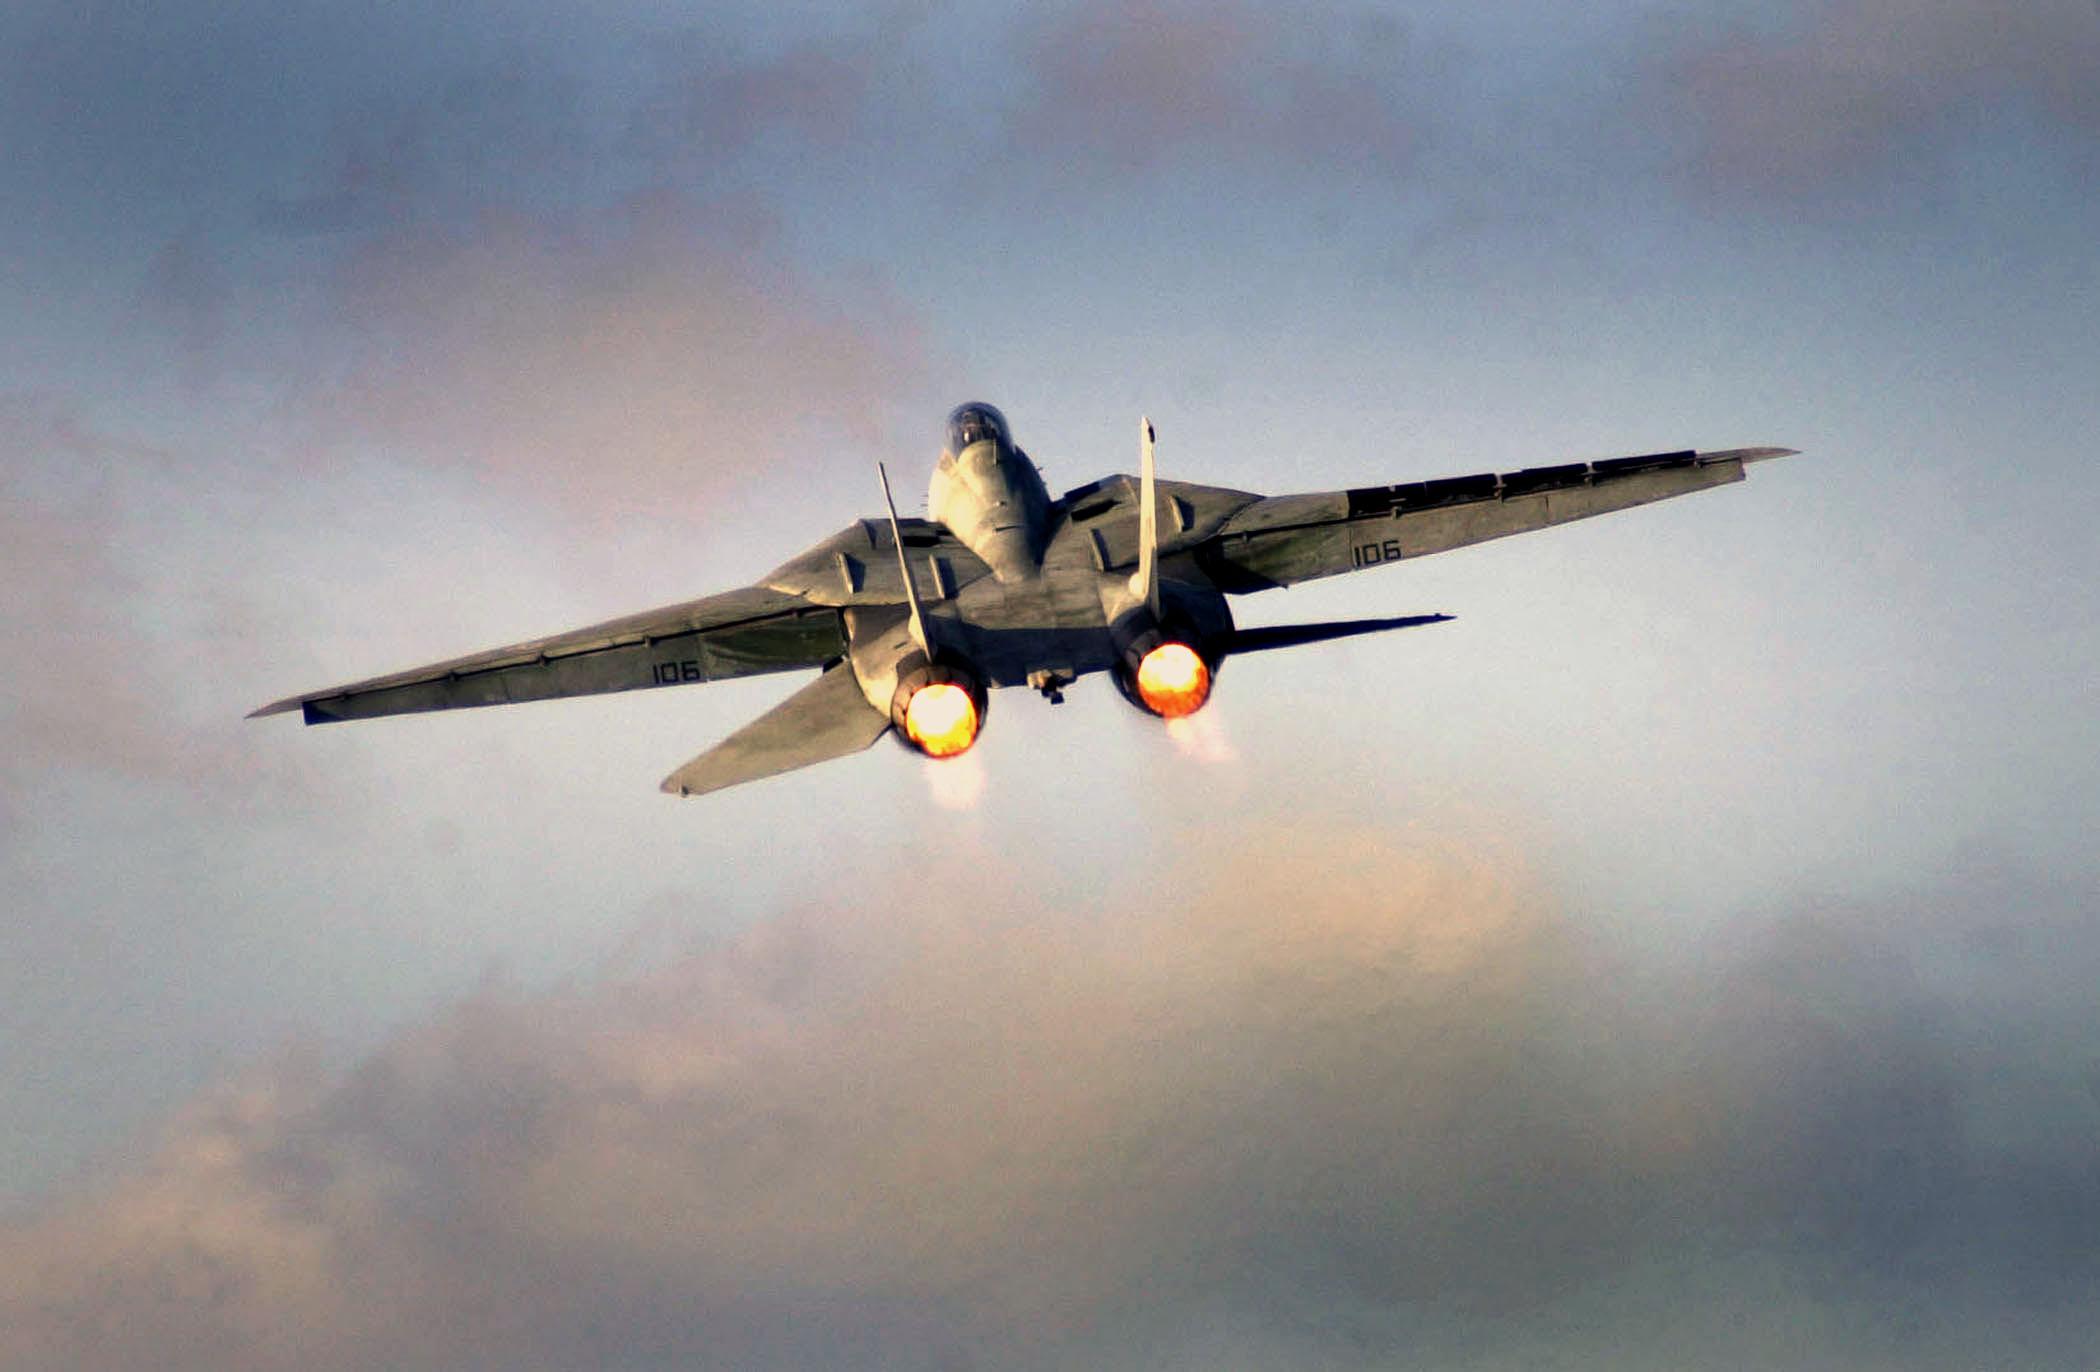 F 14 (戦闘機)の画像 p1_33